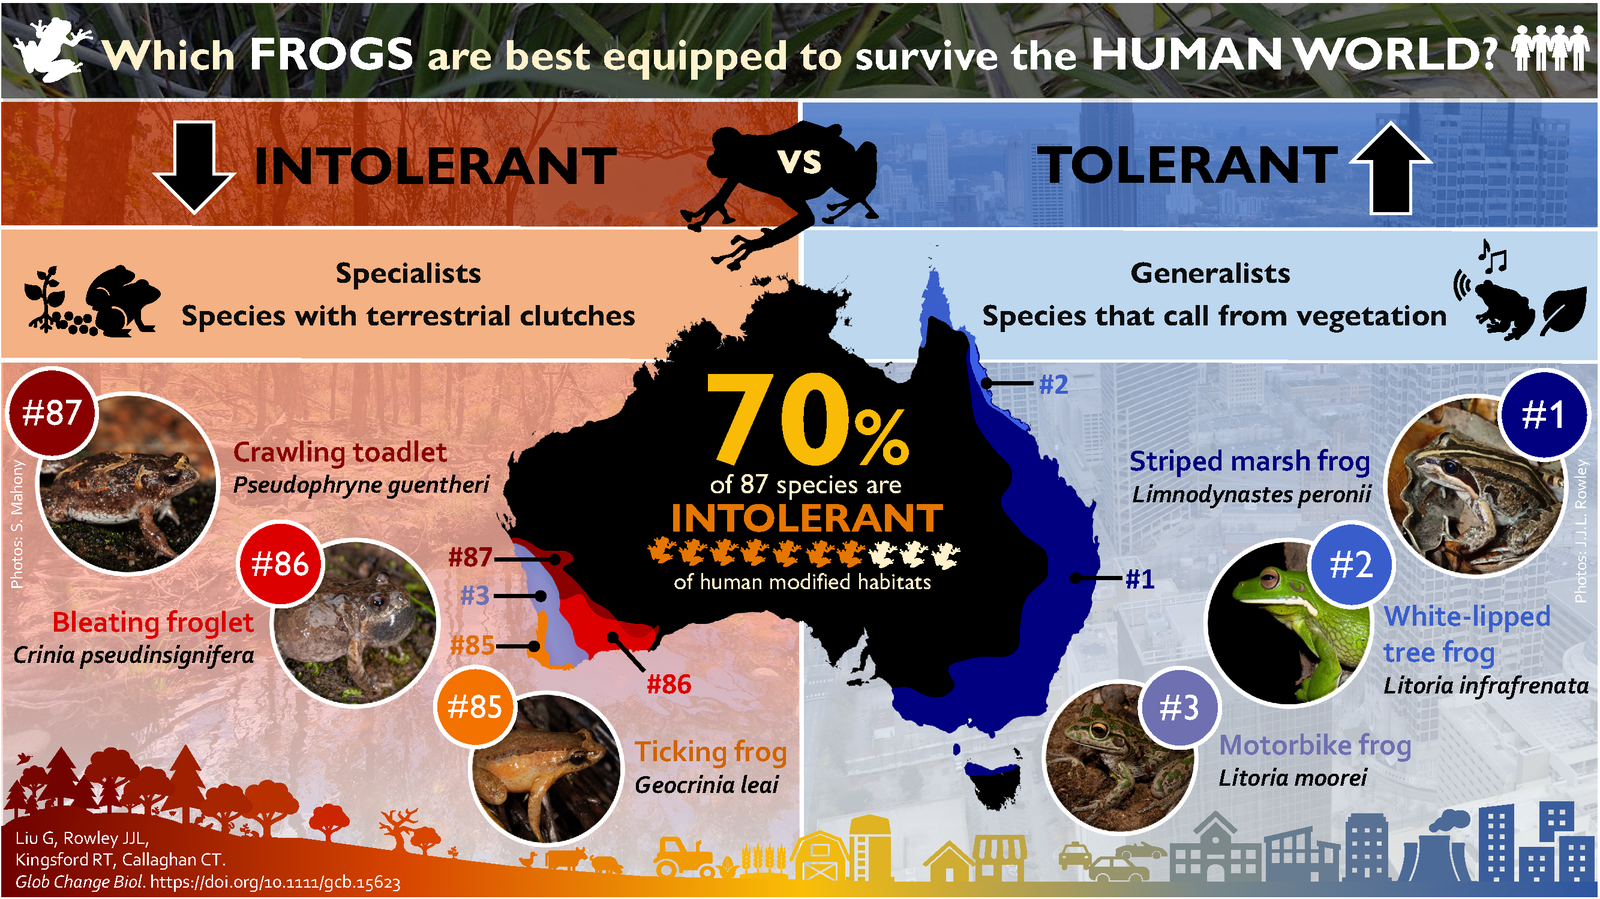 Some of Australia's most and least tolerant fogs. [Source: Gracie Liu. Copyright: Gracie Liu].